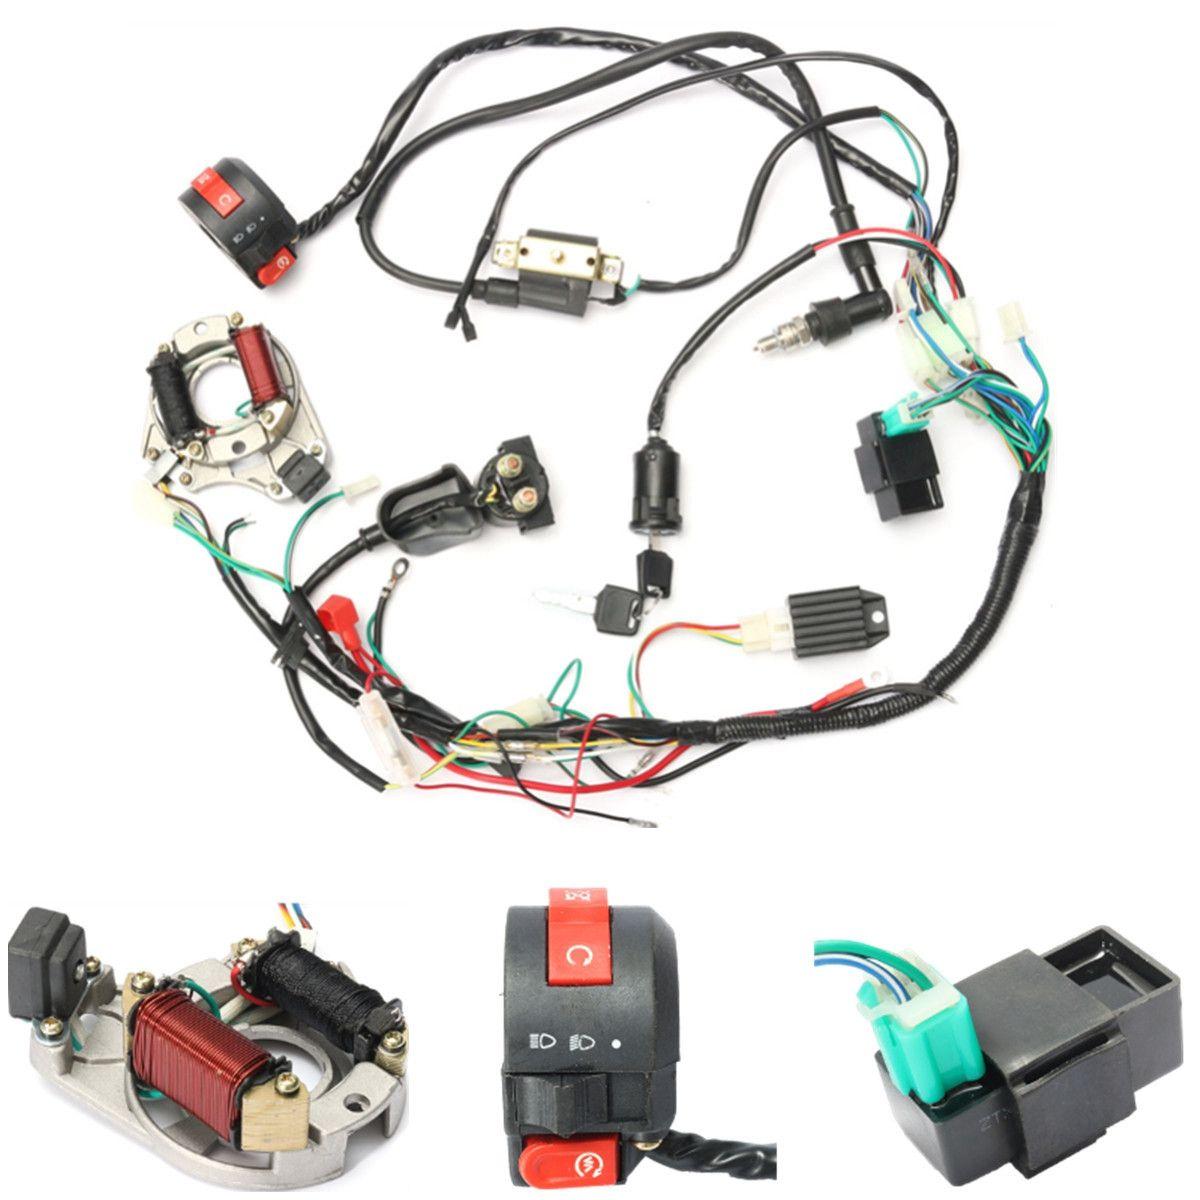 50cc 70cc 90cc 110cc Cdi Wire Harness Assembly Wiring Kit Atv Automotive Engine Wires Electric Start Quad